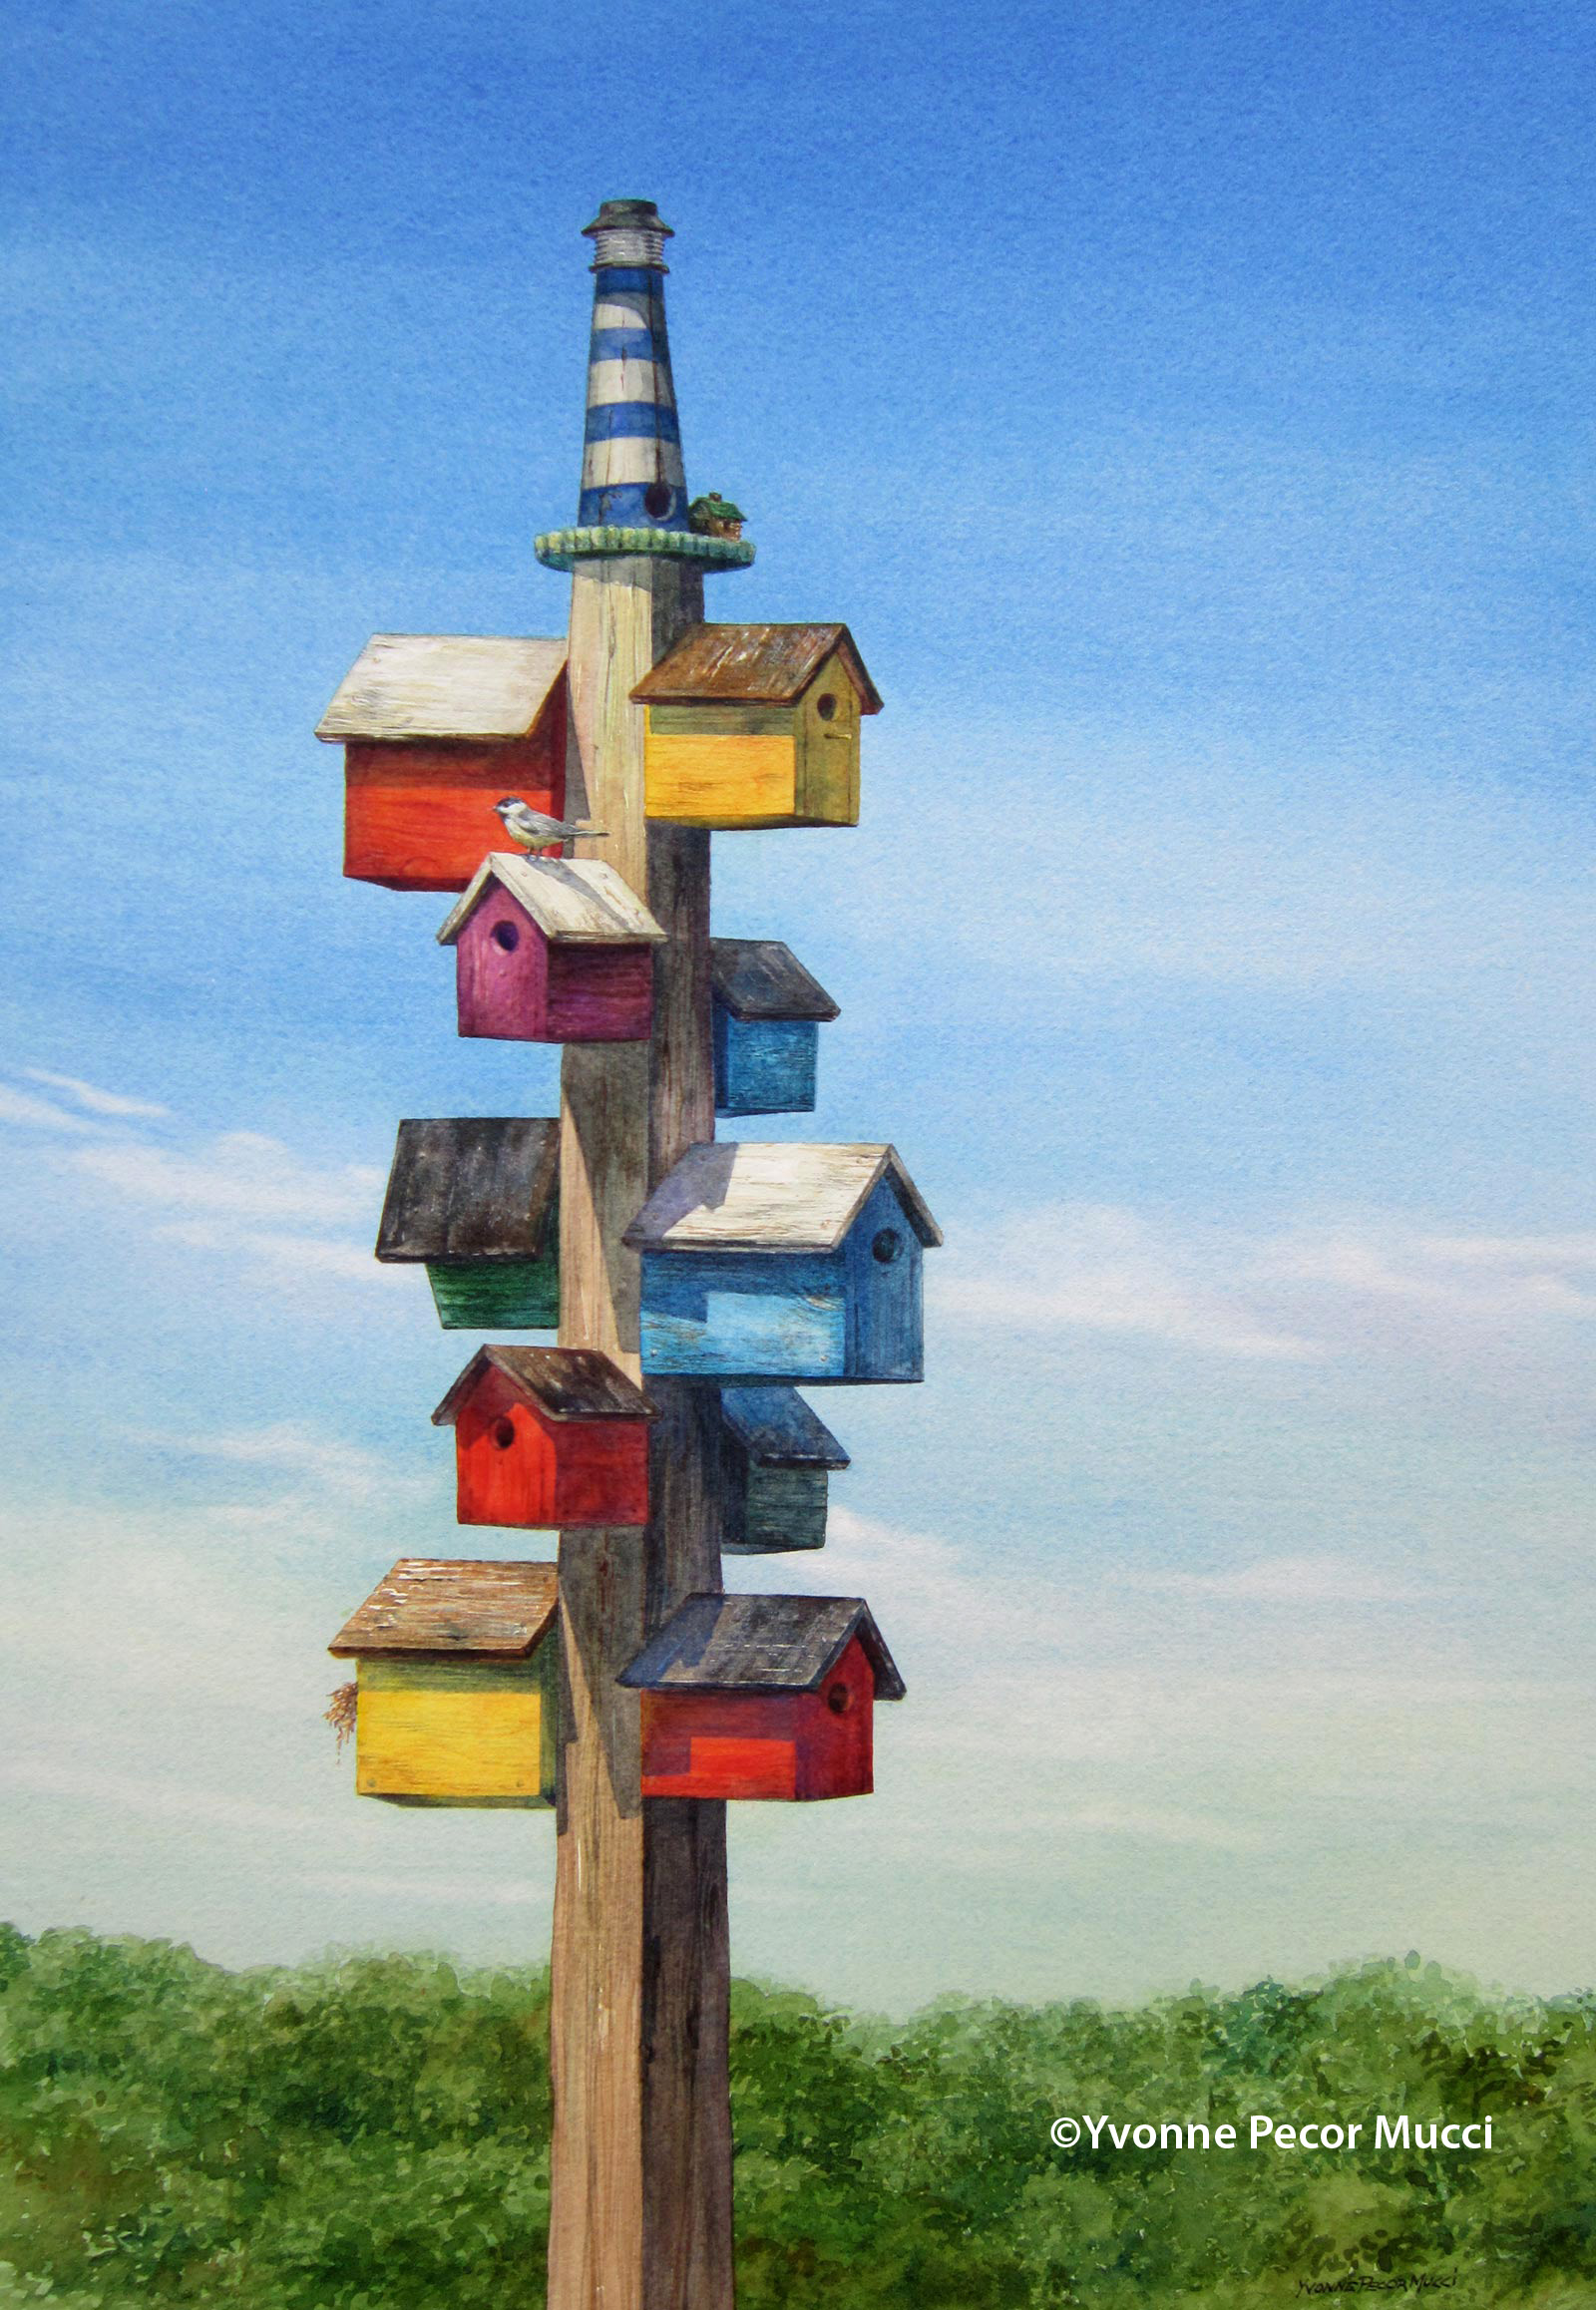 birdhouse plans edmonton